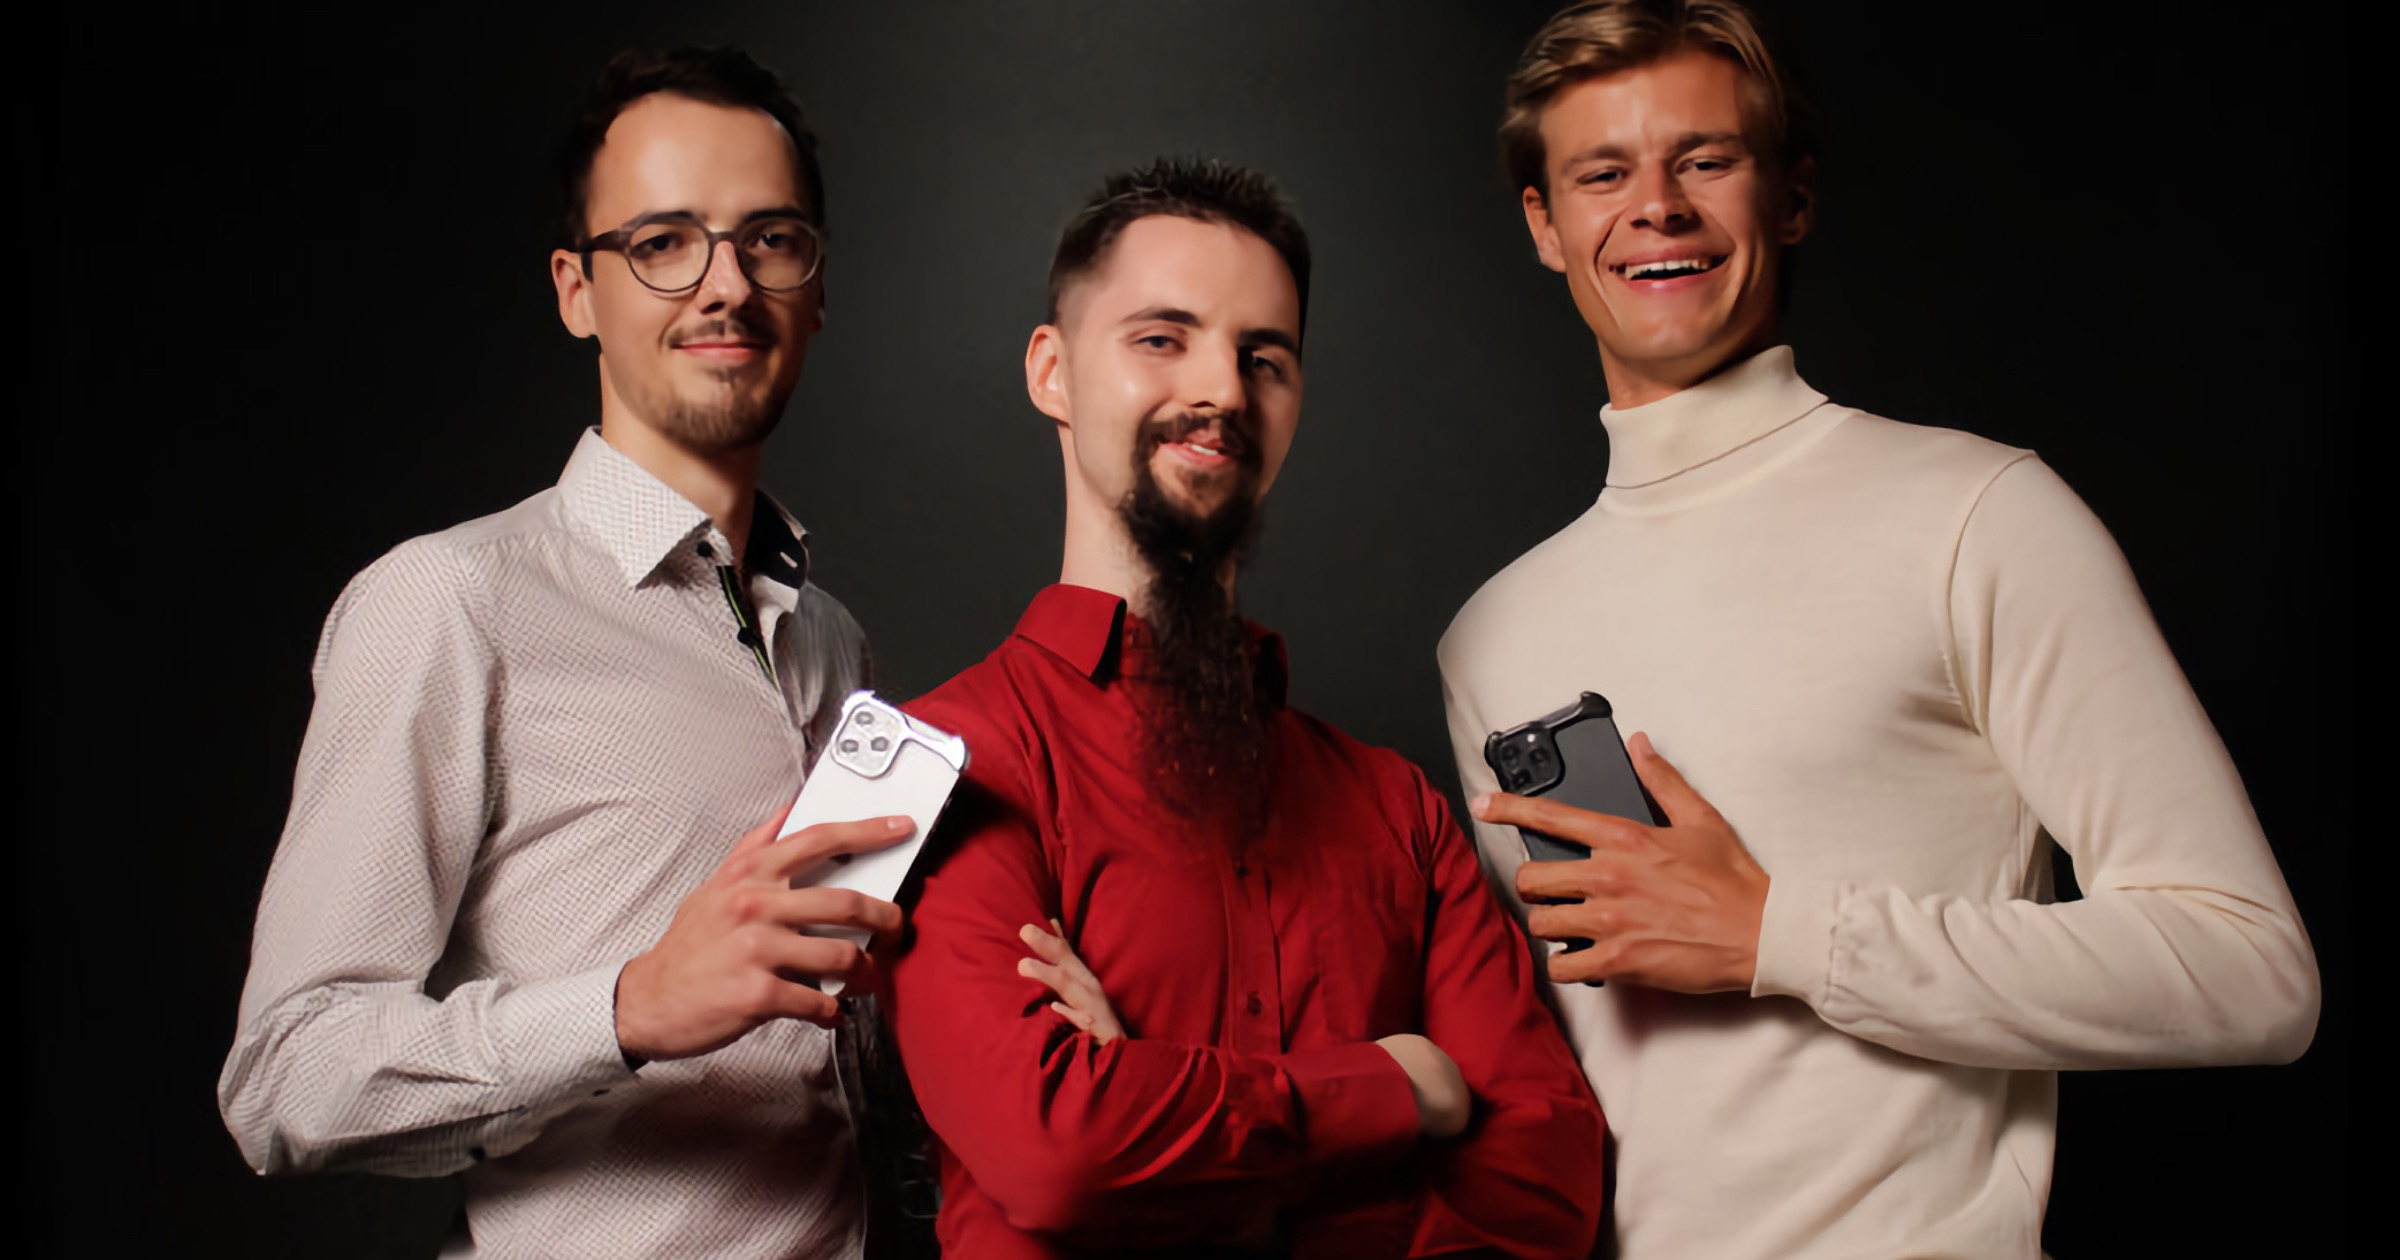 Arc Pulse is a Minimalist Titanium Bumper for iPhone 12